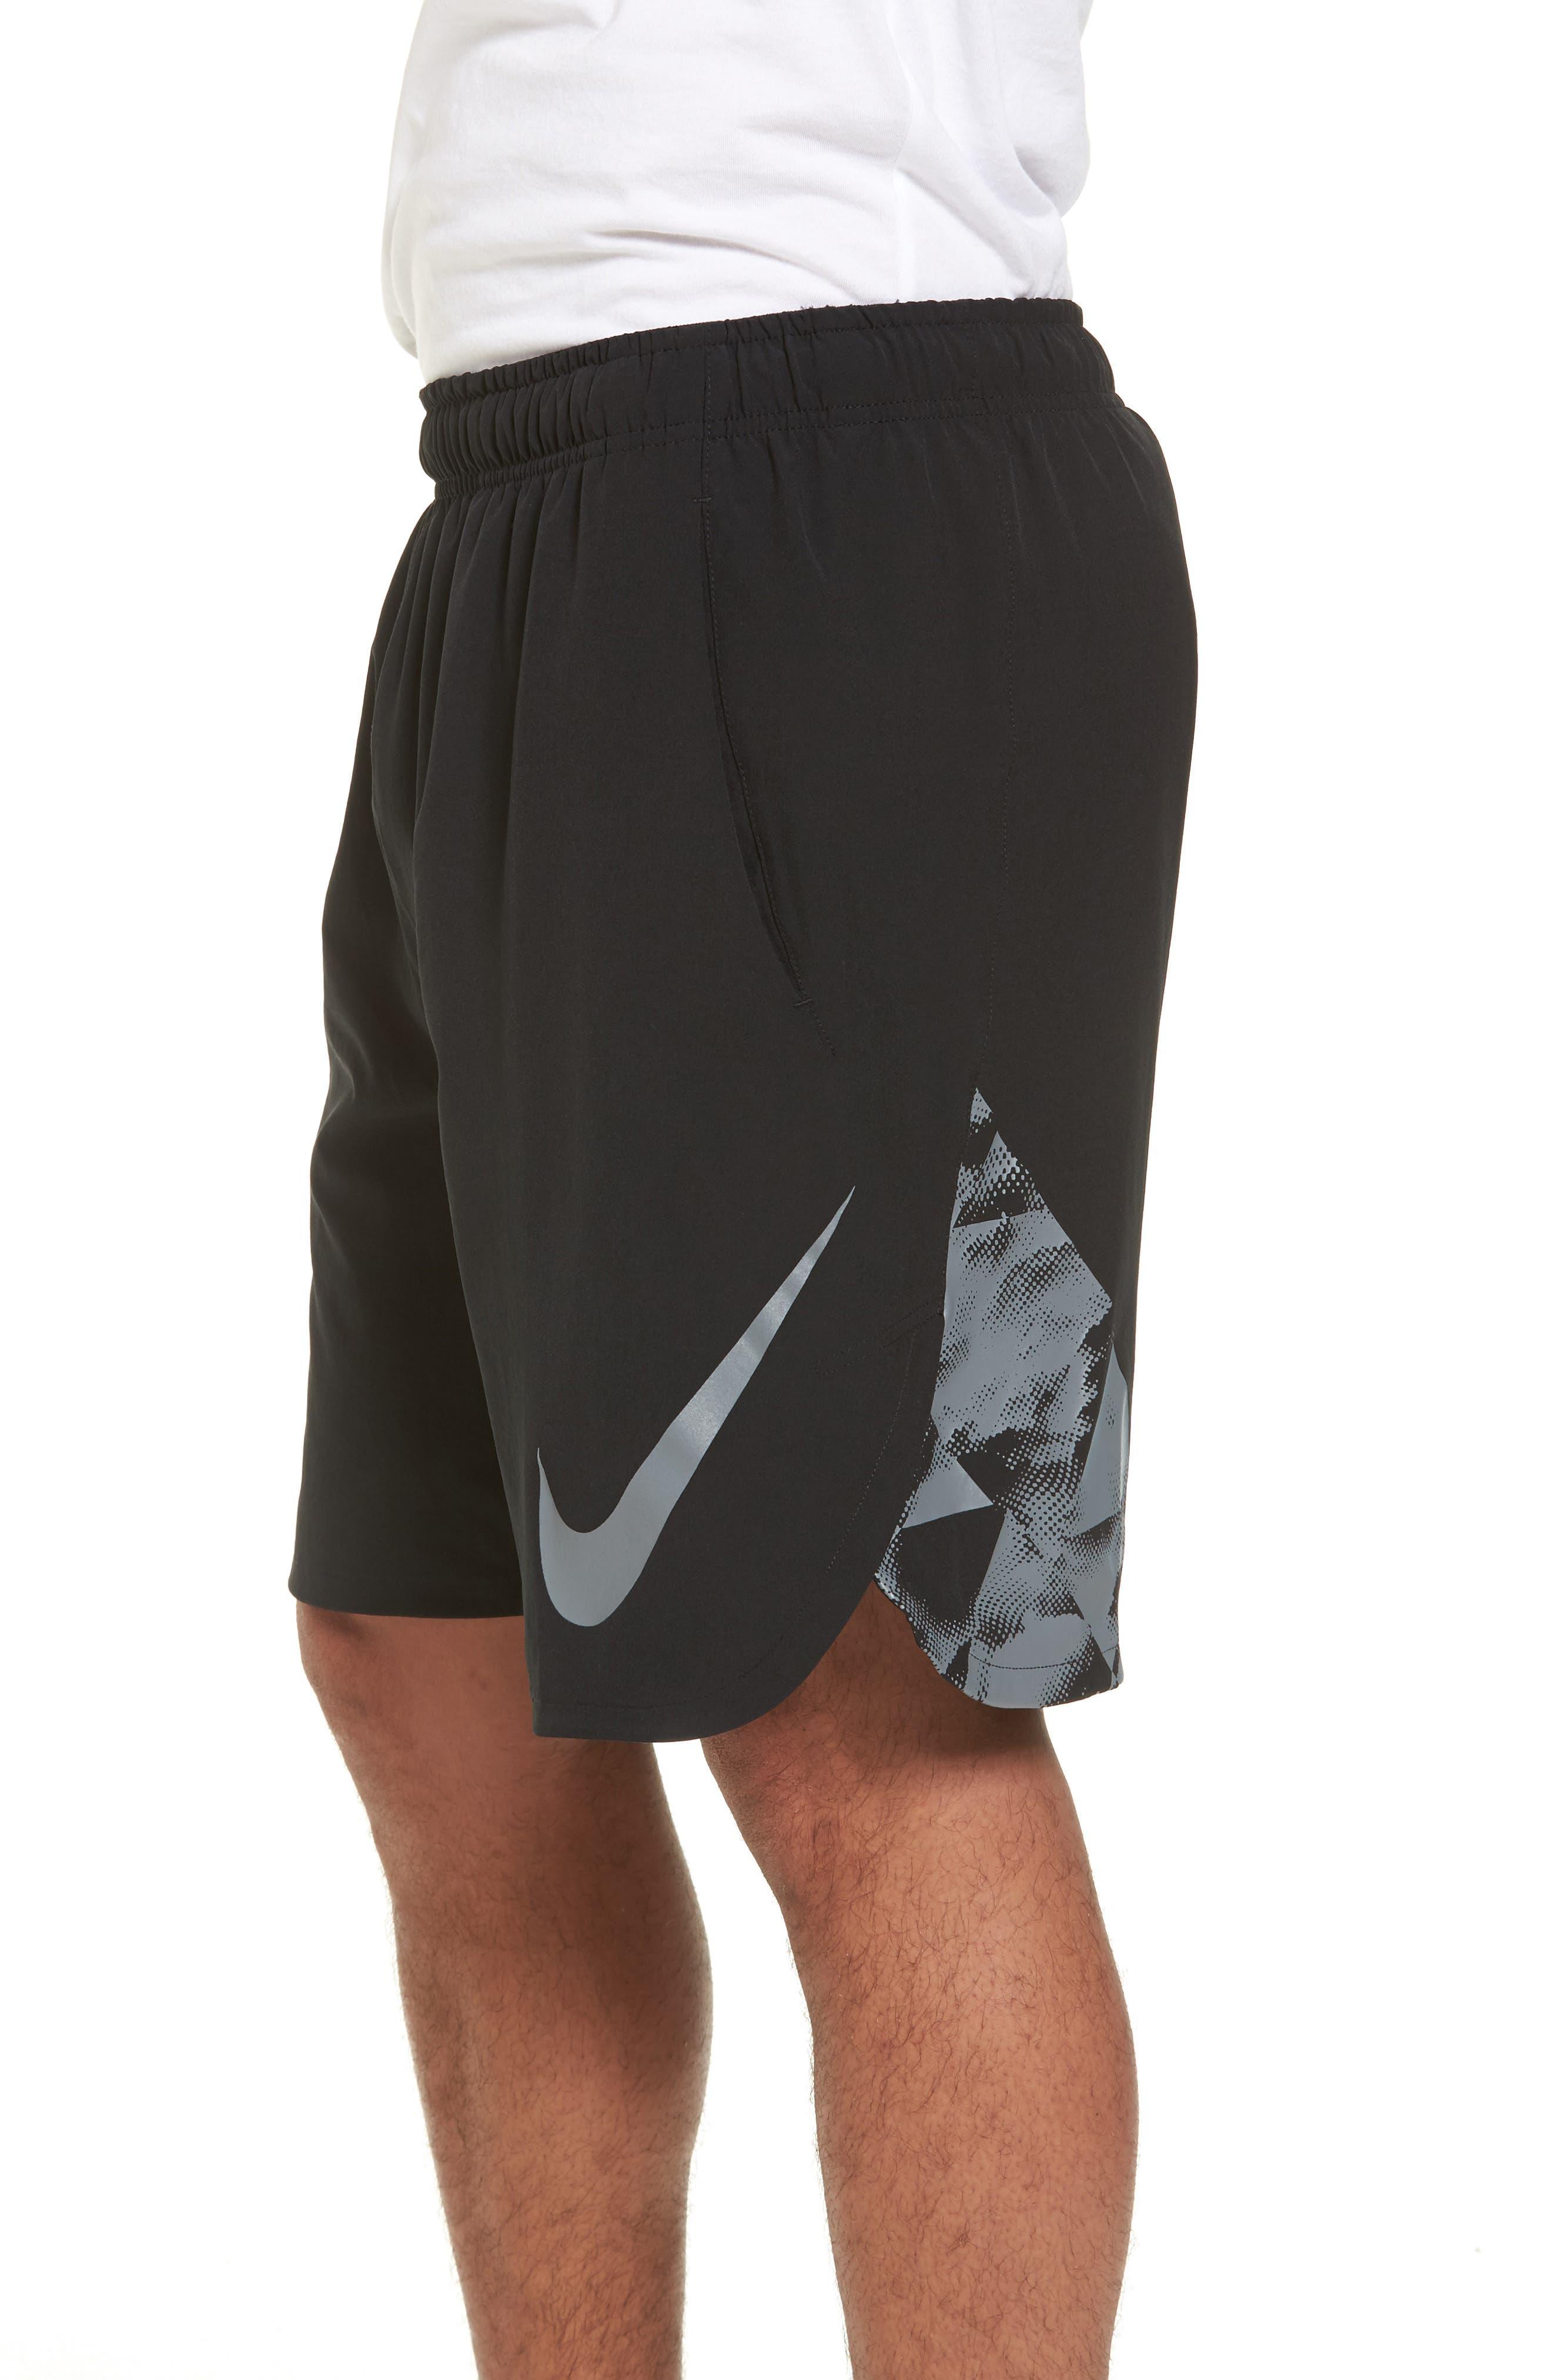 Flex Training Shorts,                             Alternate thumbnail 3, color,                             010